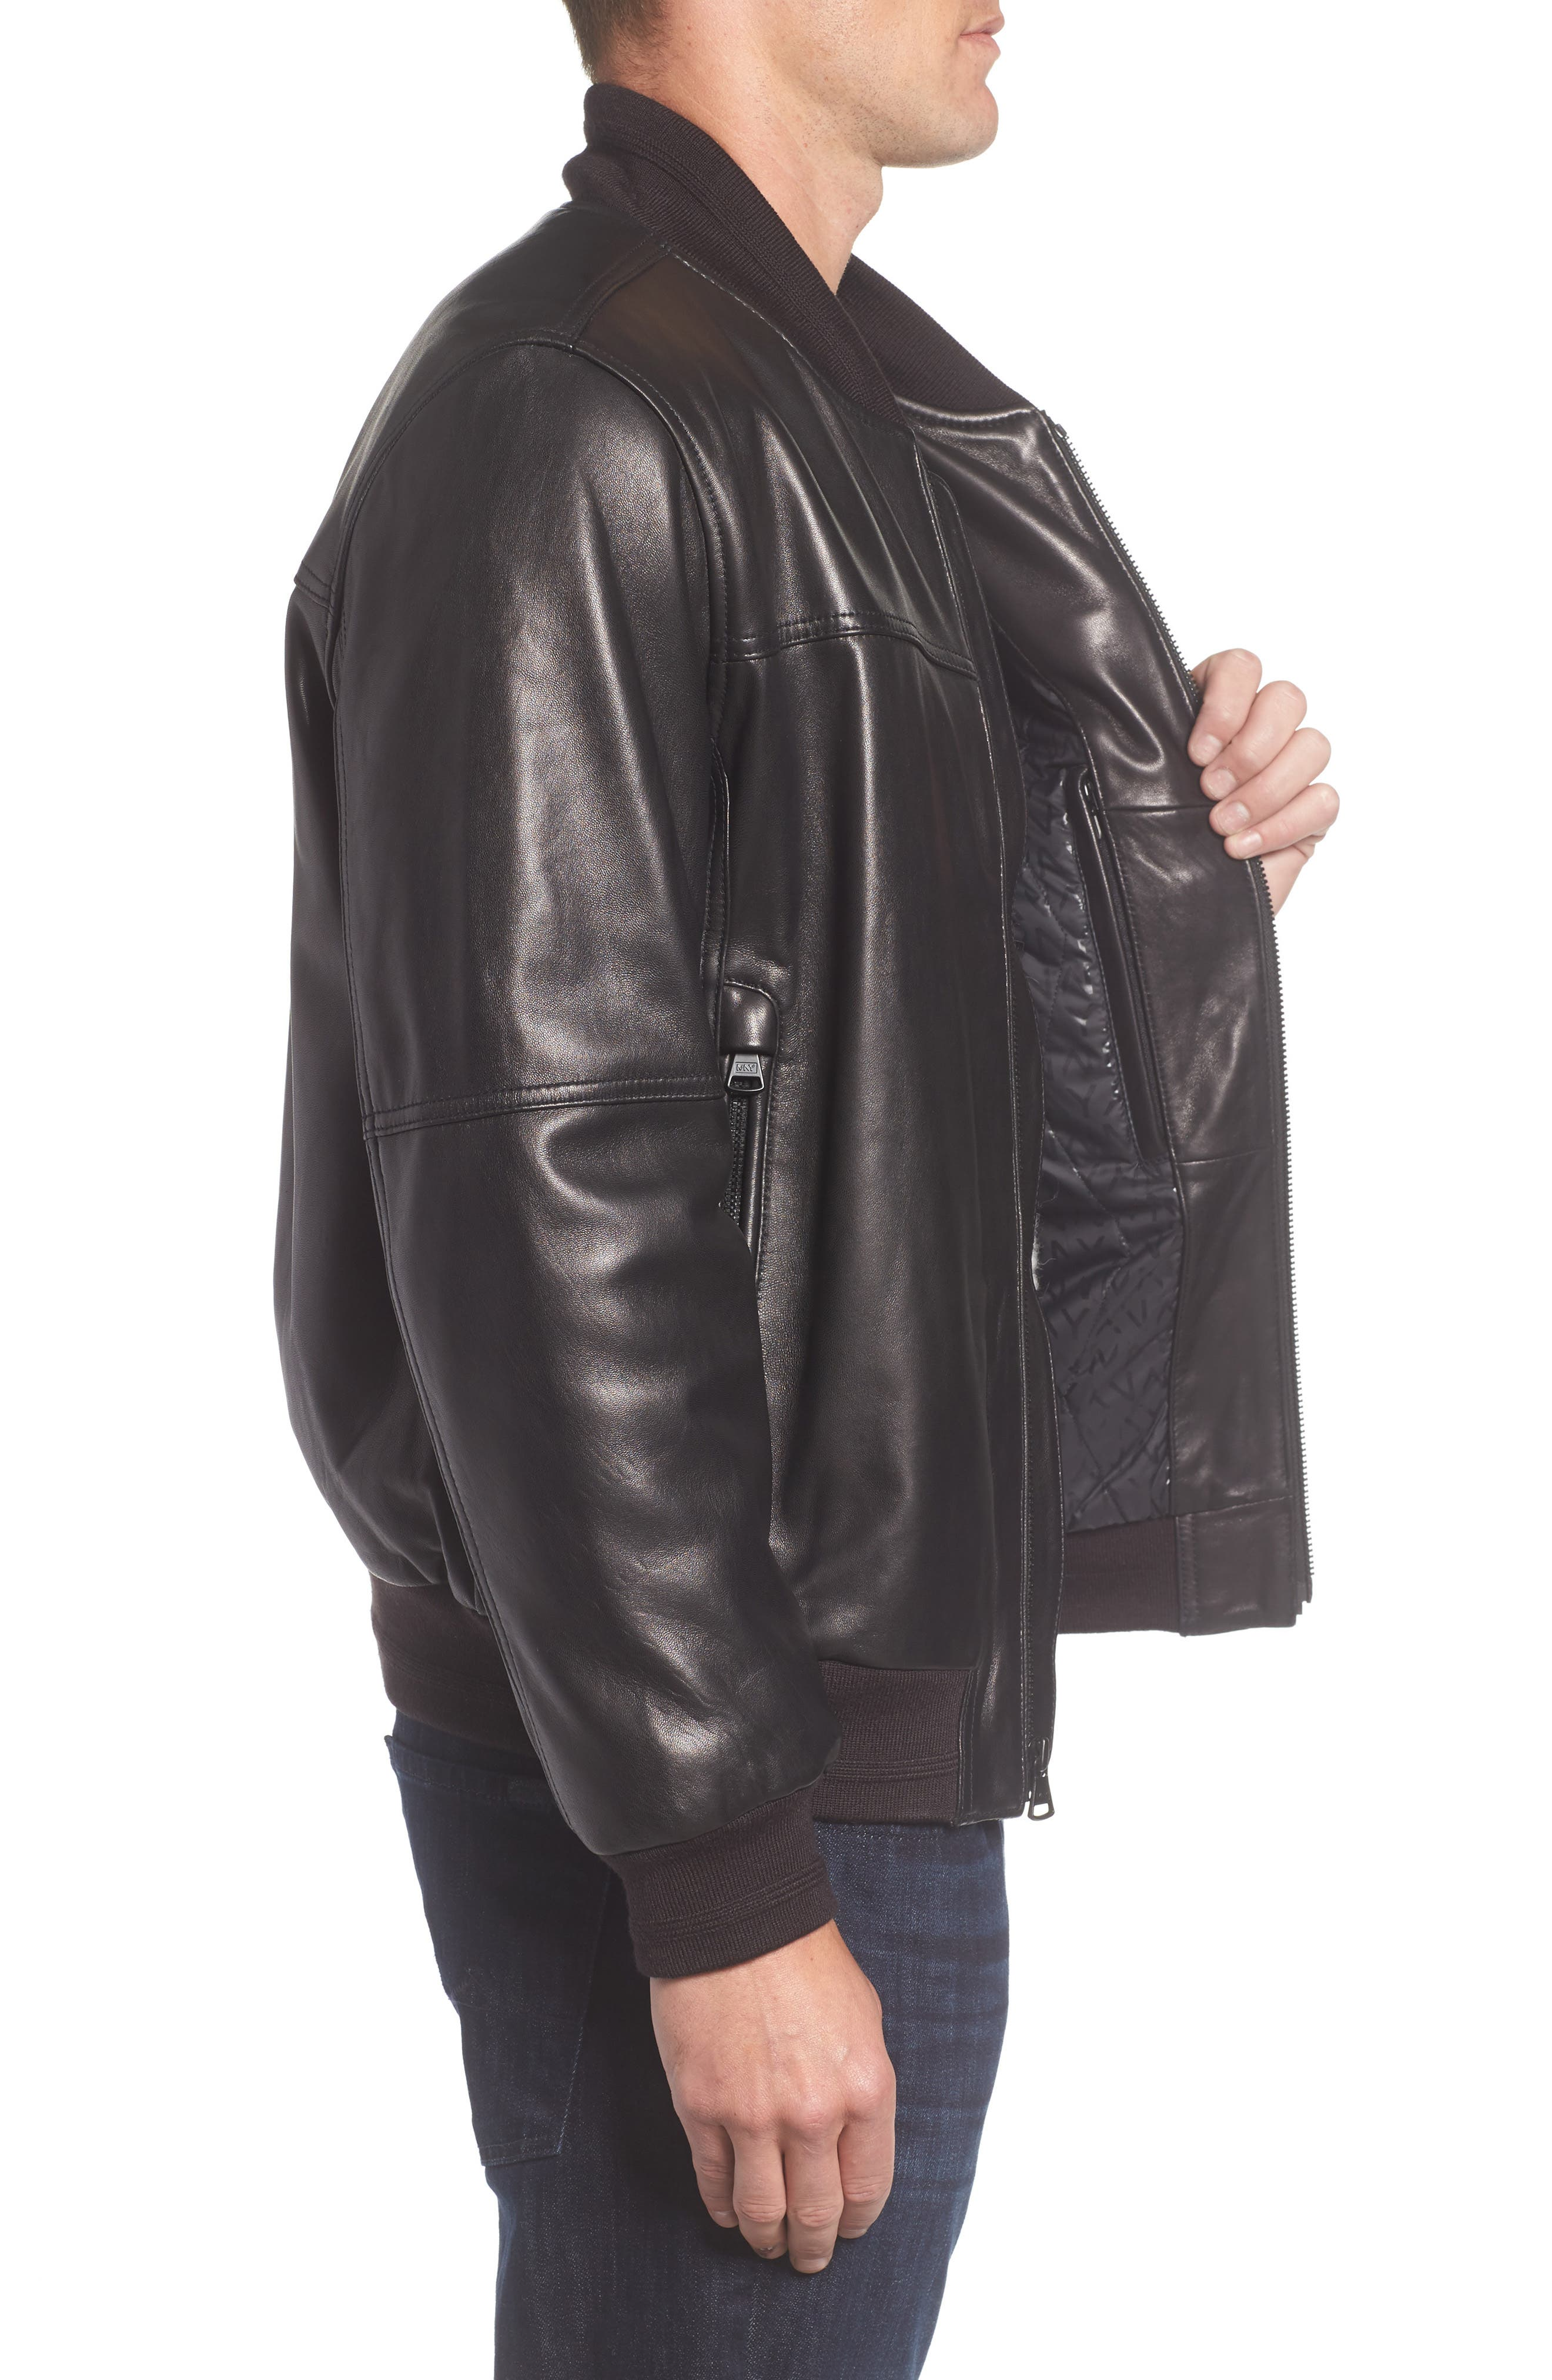 MARC NEW YORK, Summit Leather Jacket, Alternate thumbnail 3, color, BLACK